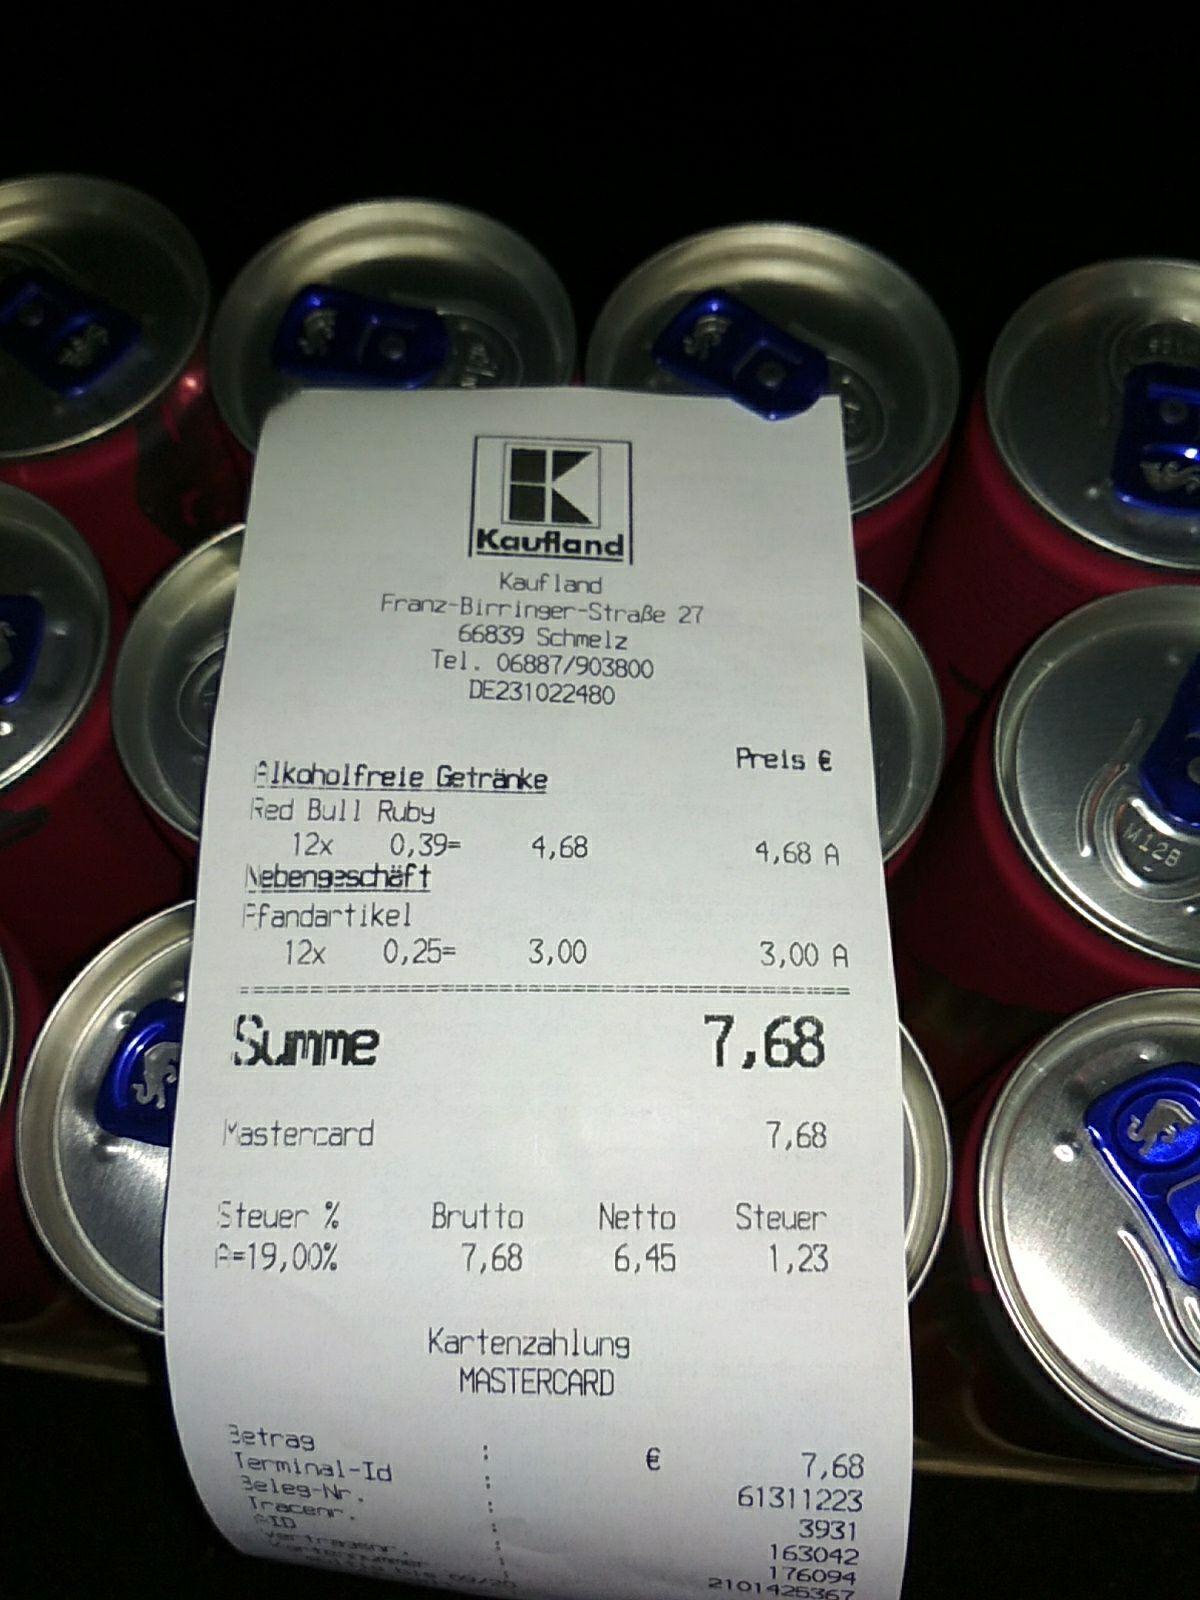 [Lokal?] Red Bull Summer / Ruby 0,39€ @ Kaufland Schmelz (MHD 19.04.)